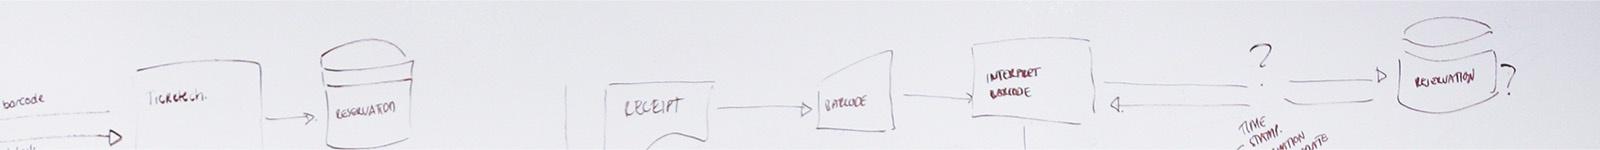 direct response marketing process.jpg